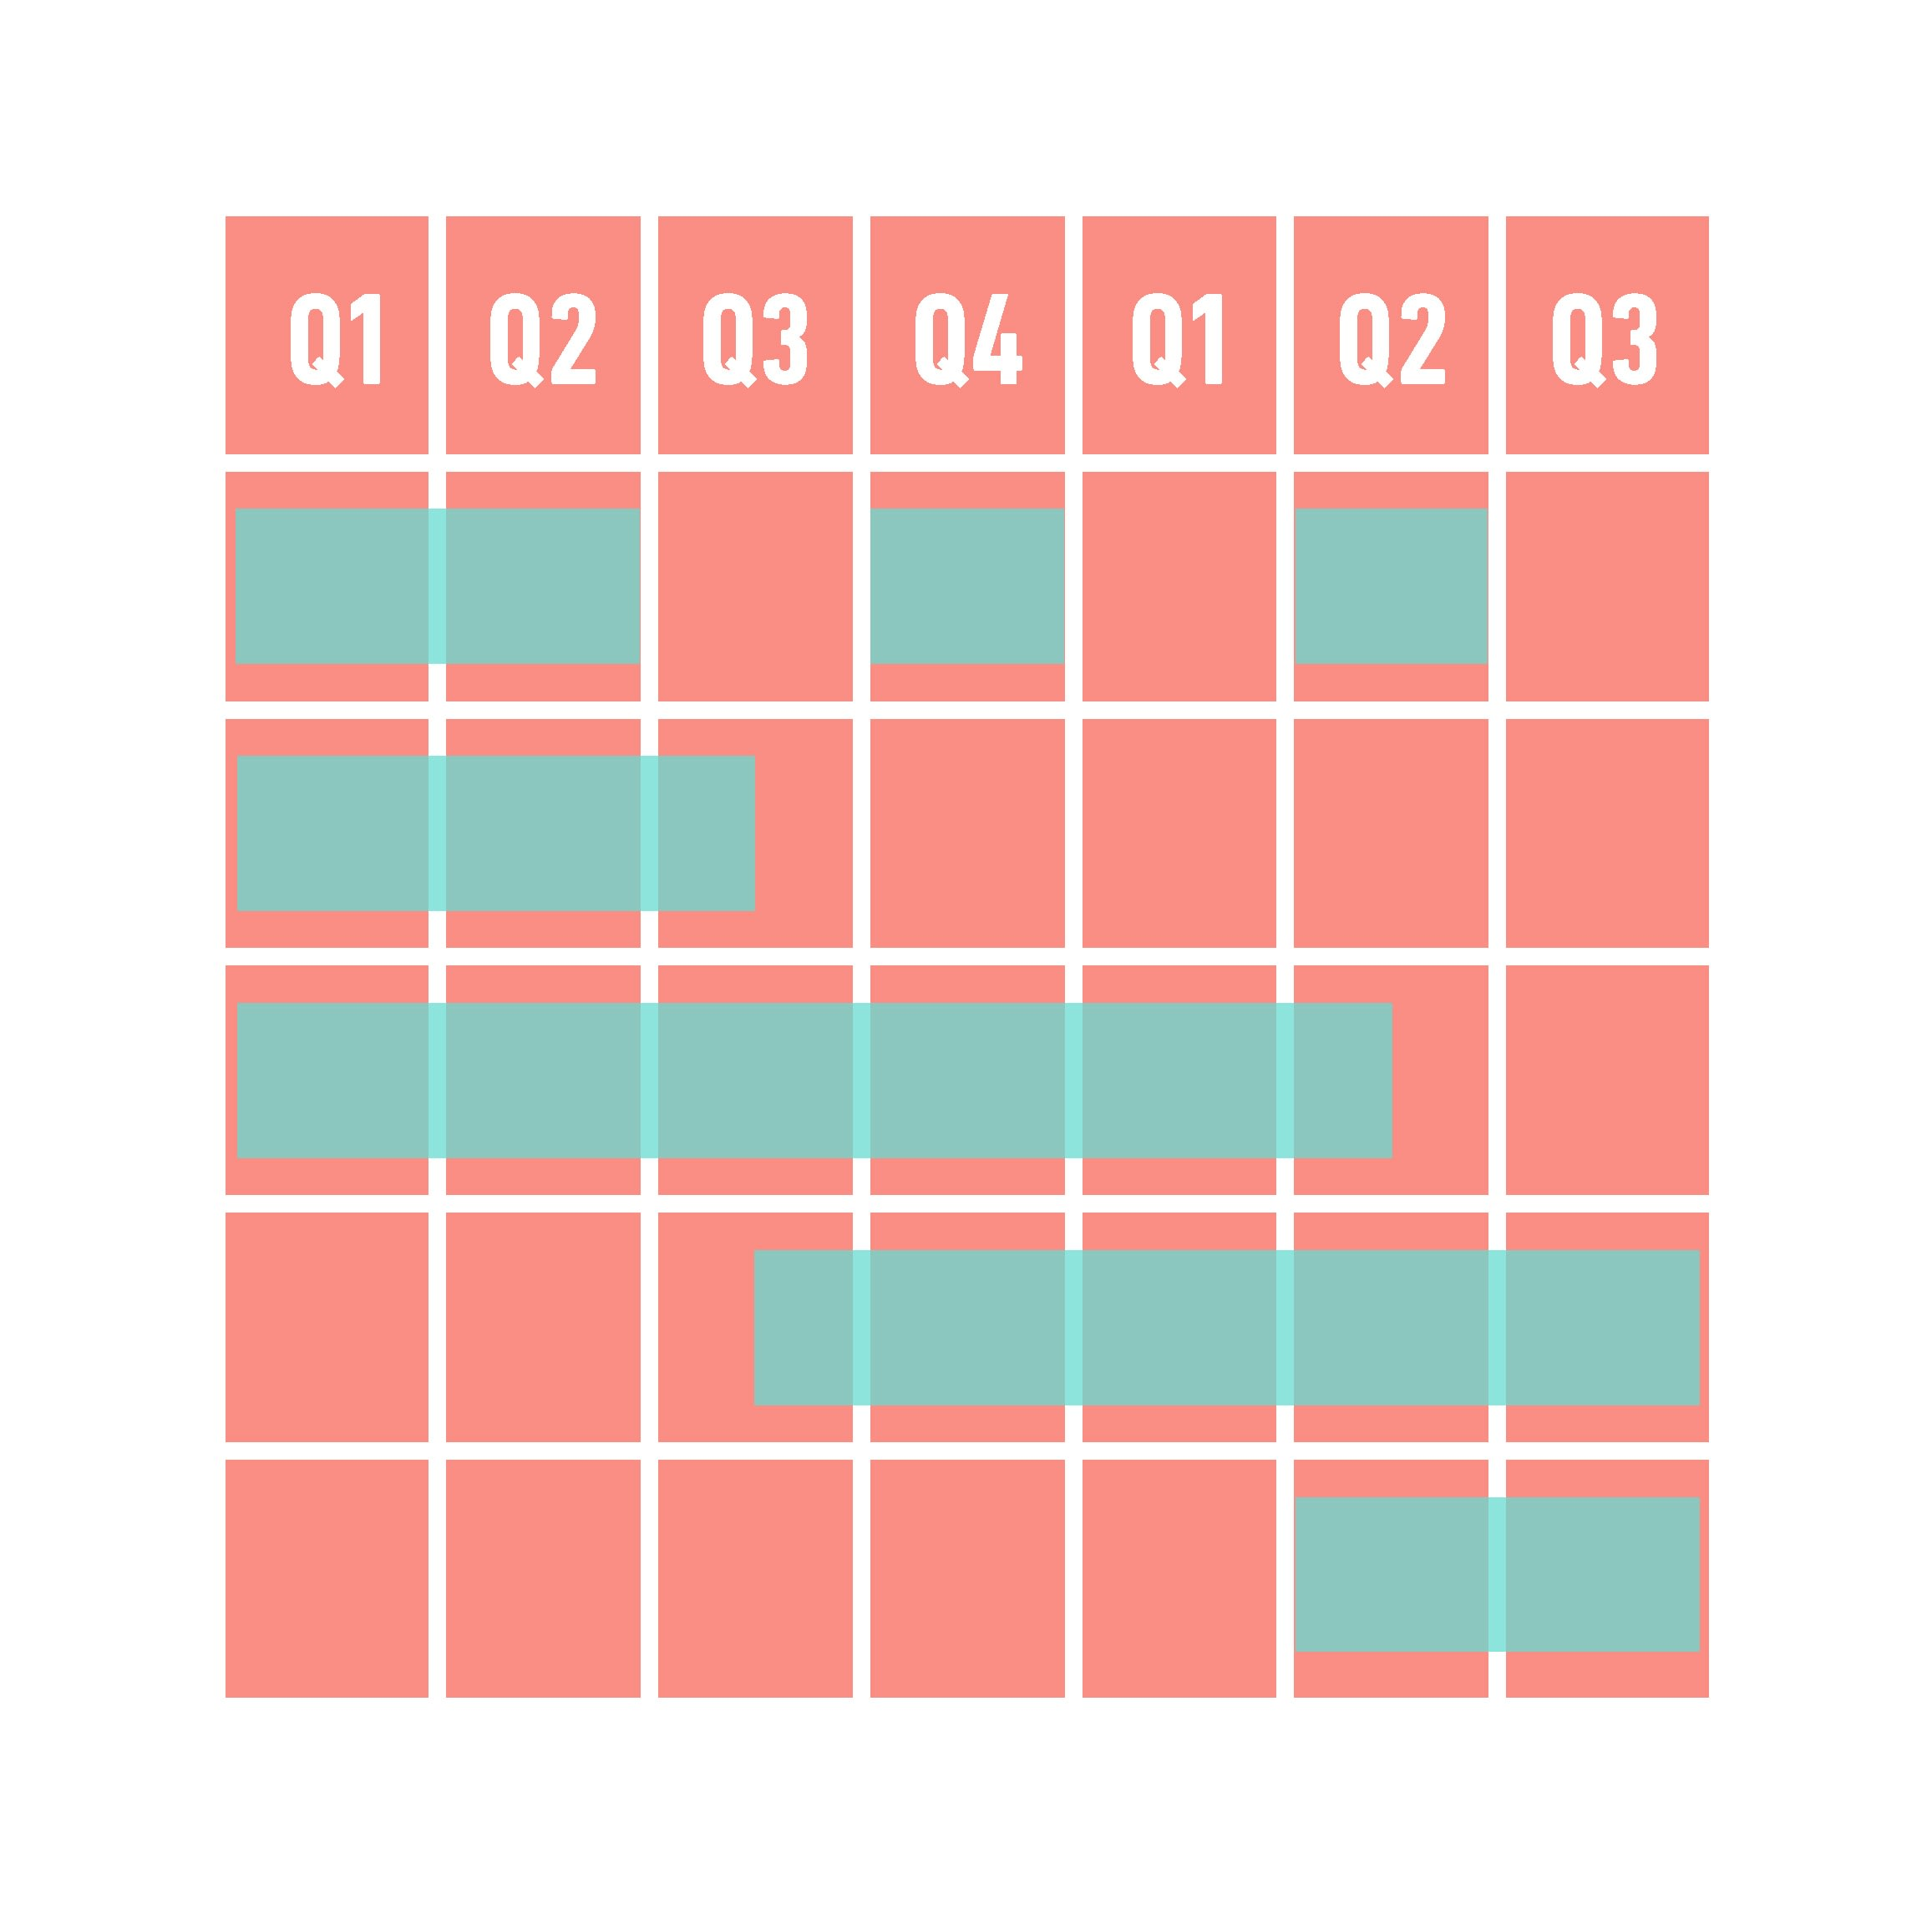 Data Visualization Example Gantt chart